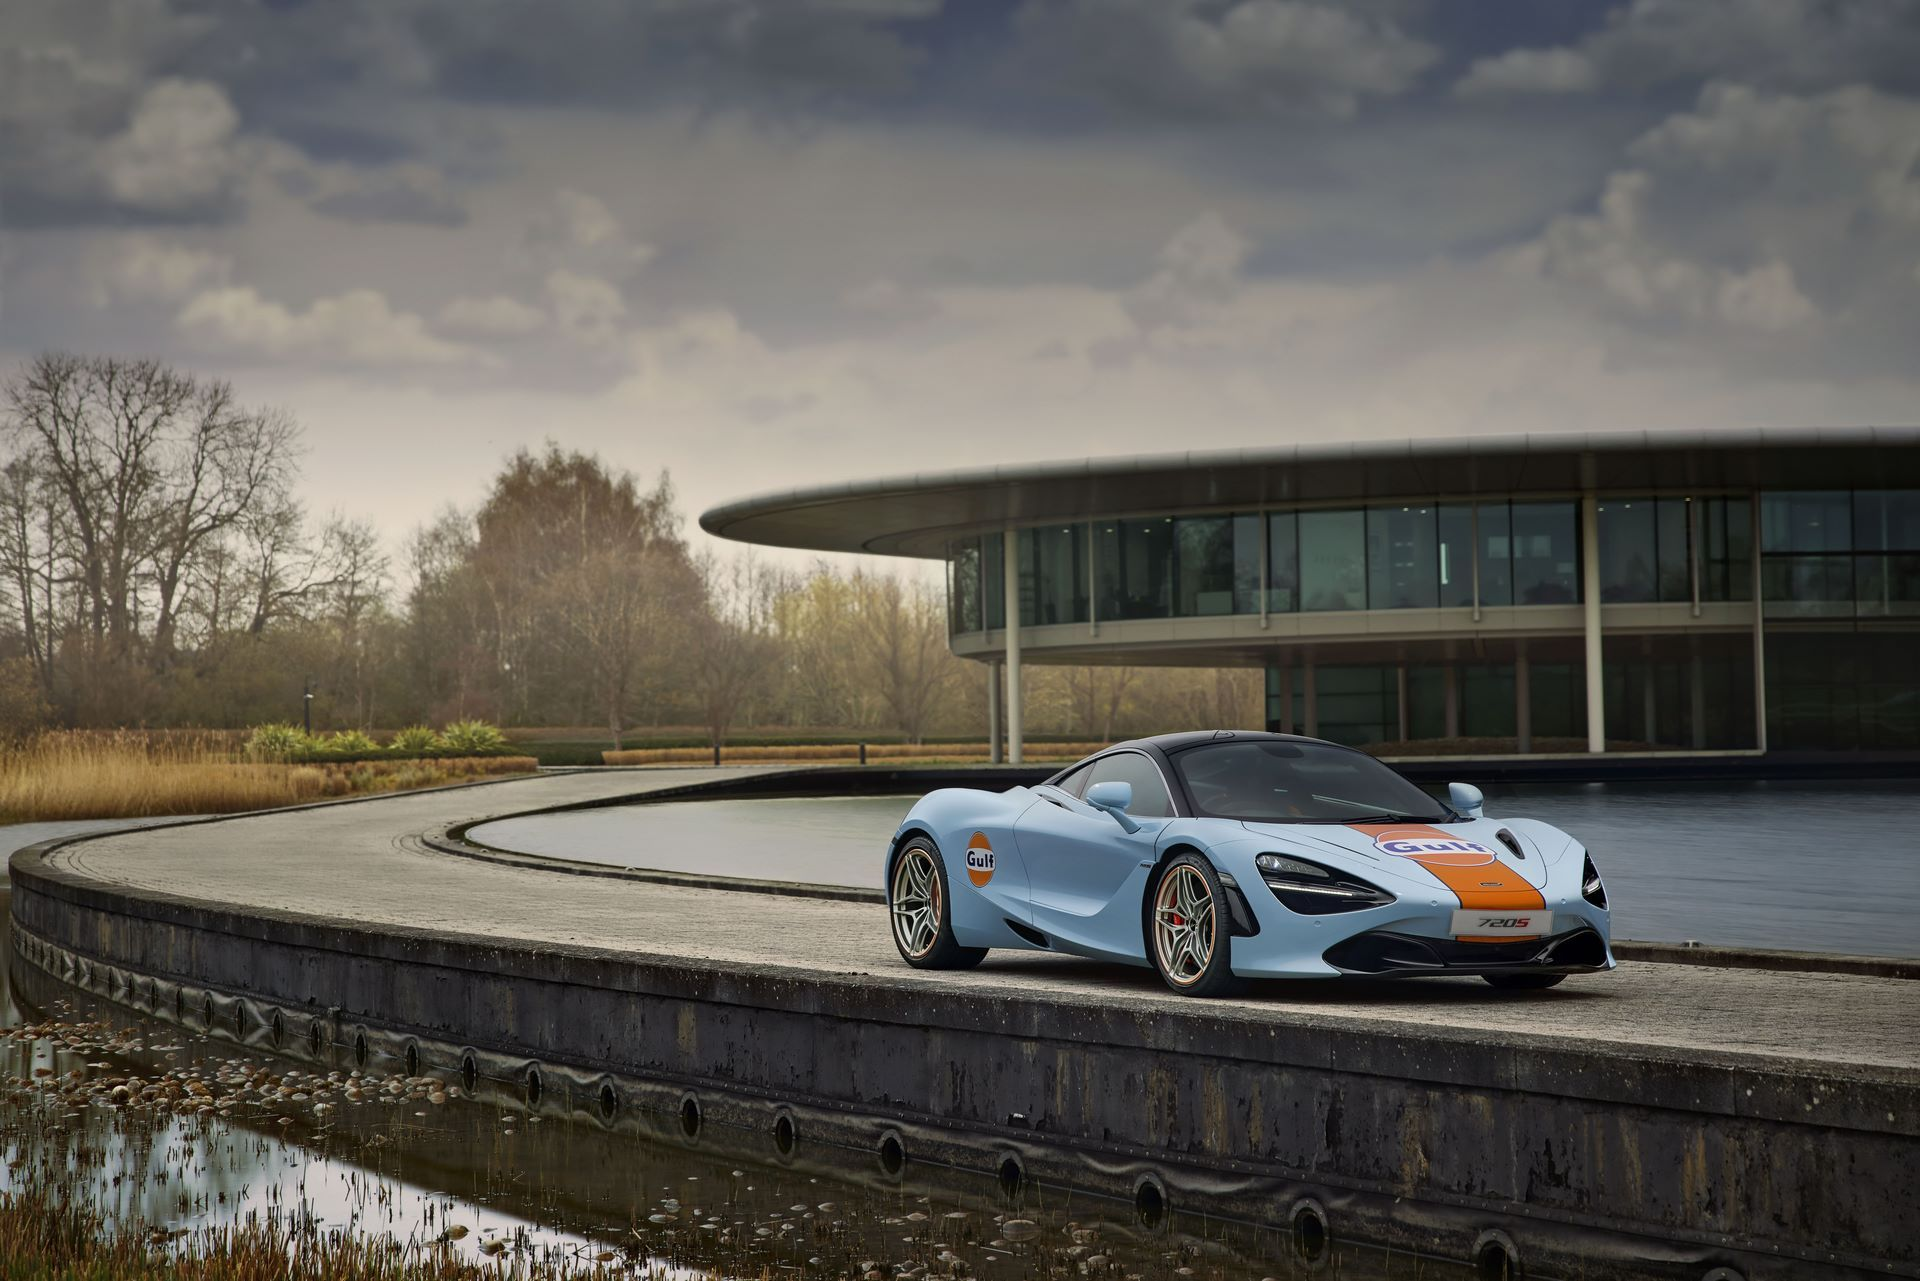 McLaren-720S-with-Gulf-livery-7